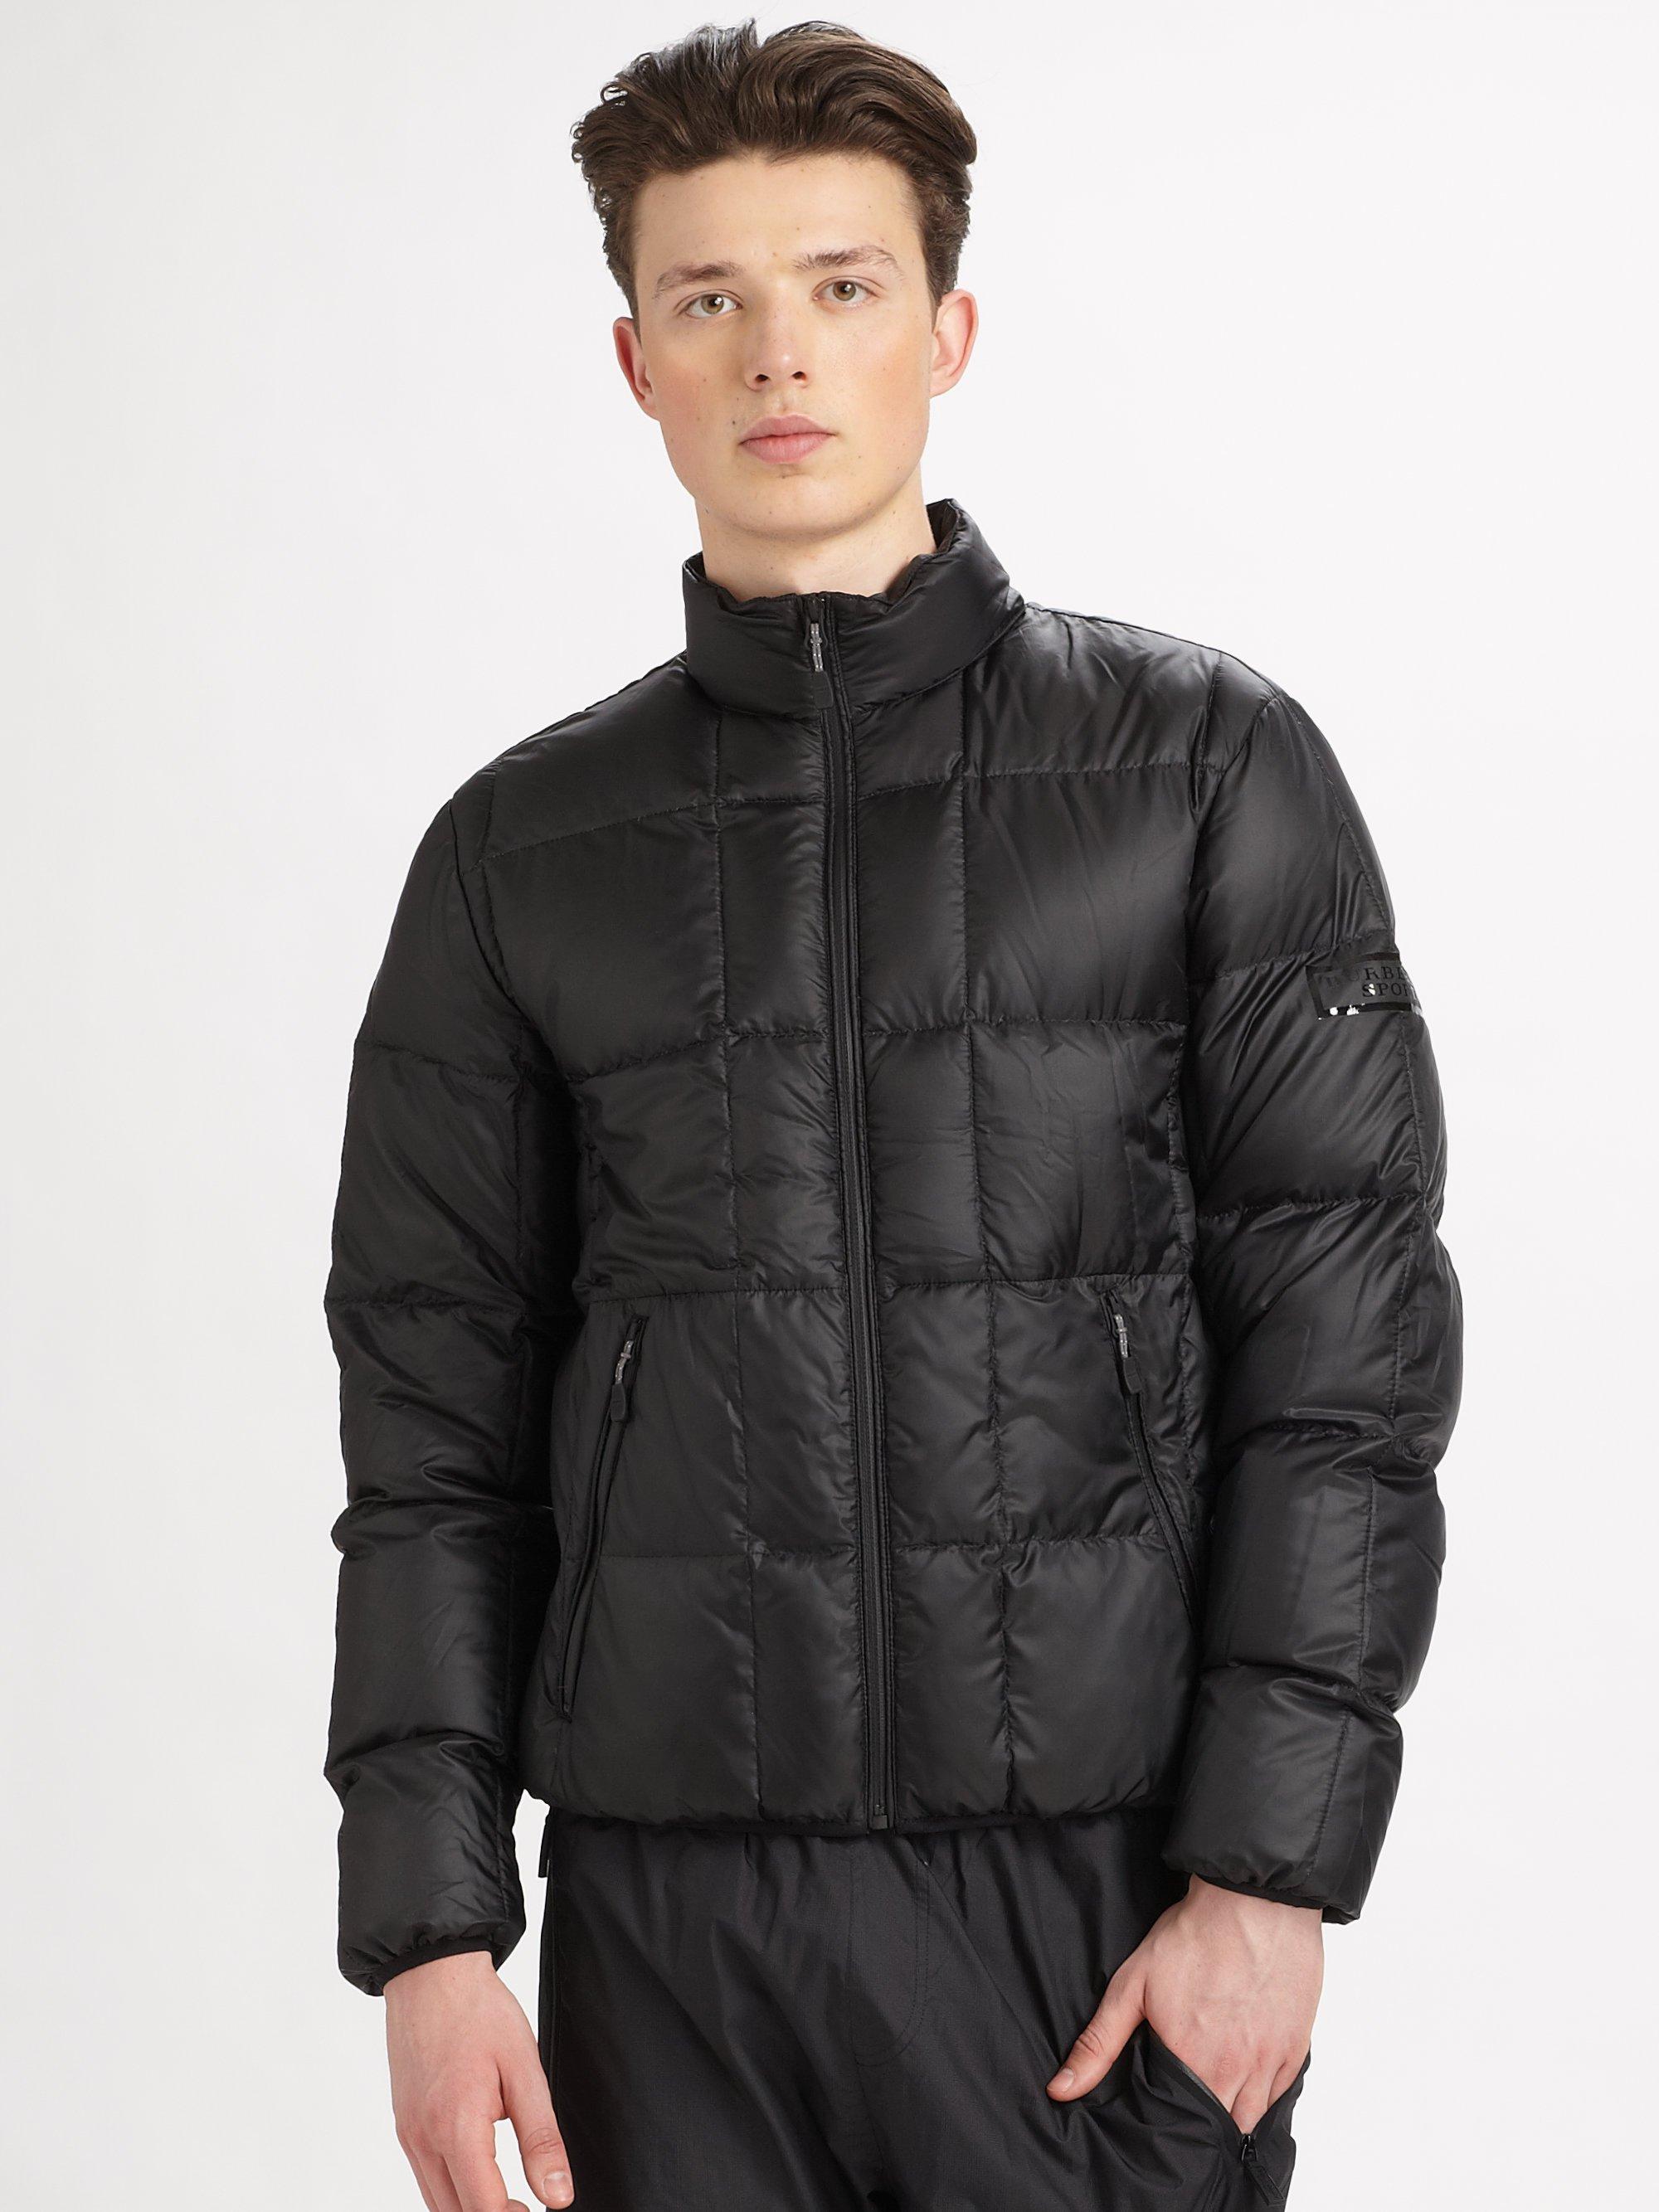 Burberry sport Puffer Jacket in Black for Men | Lyst